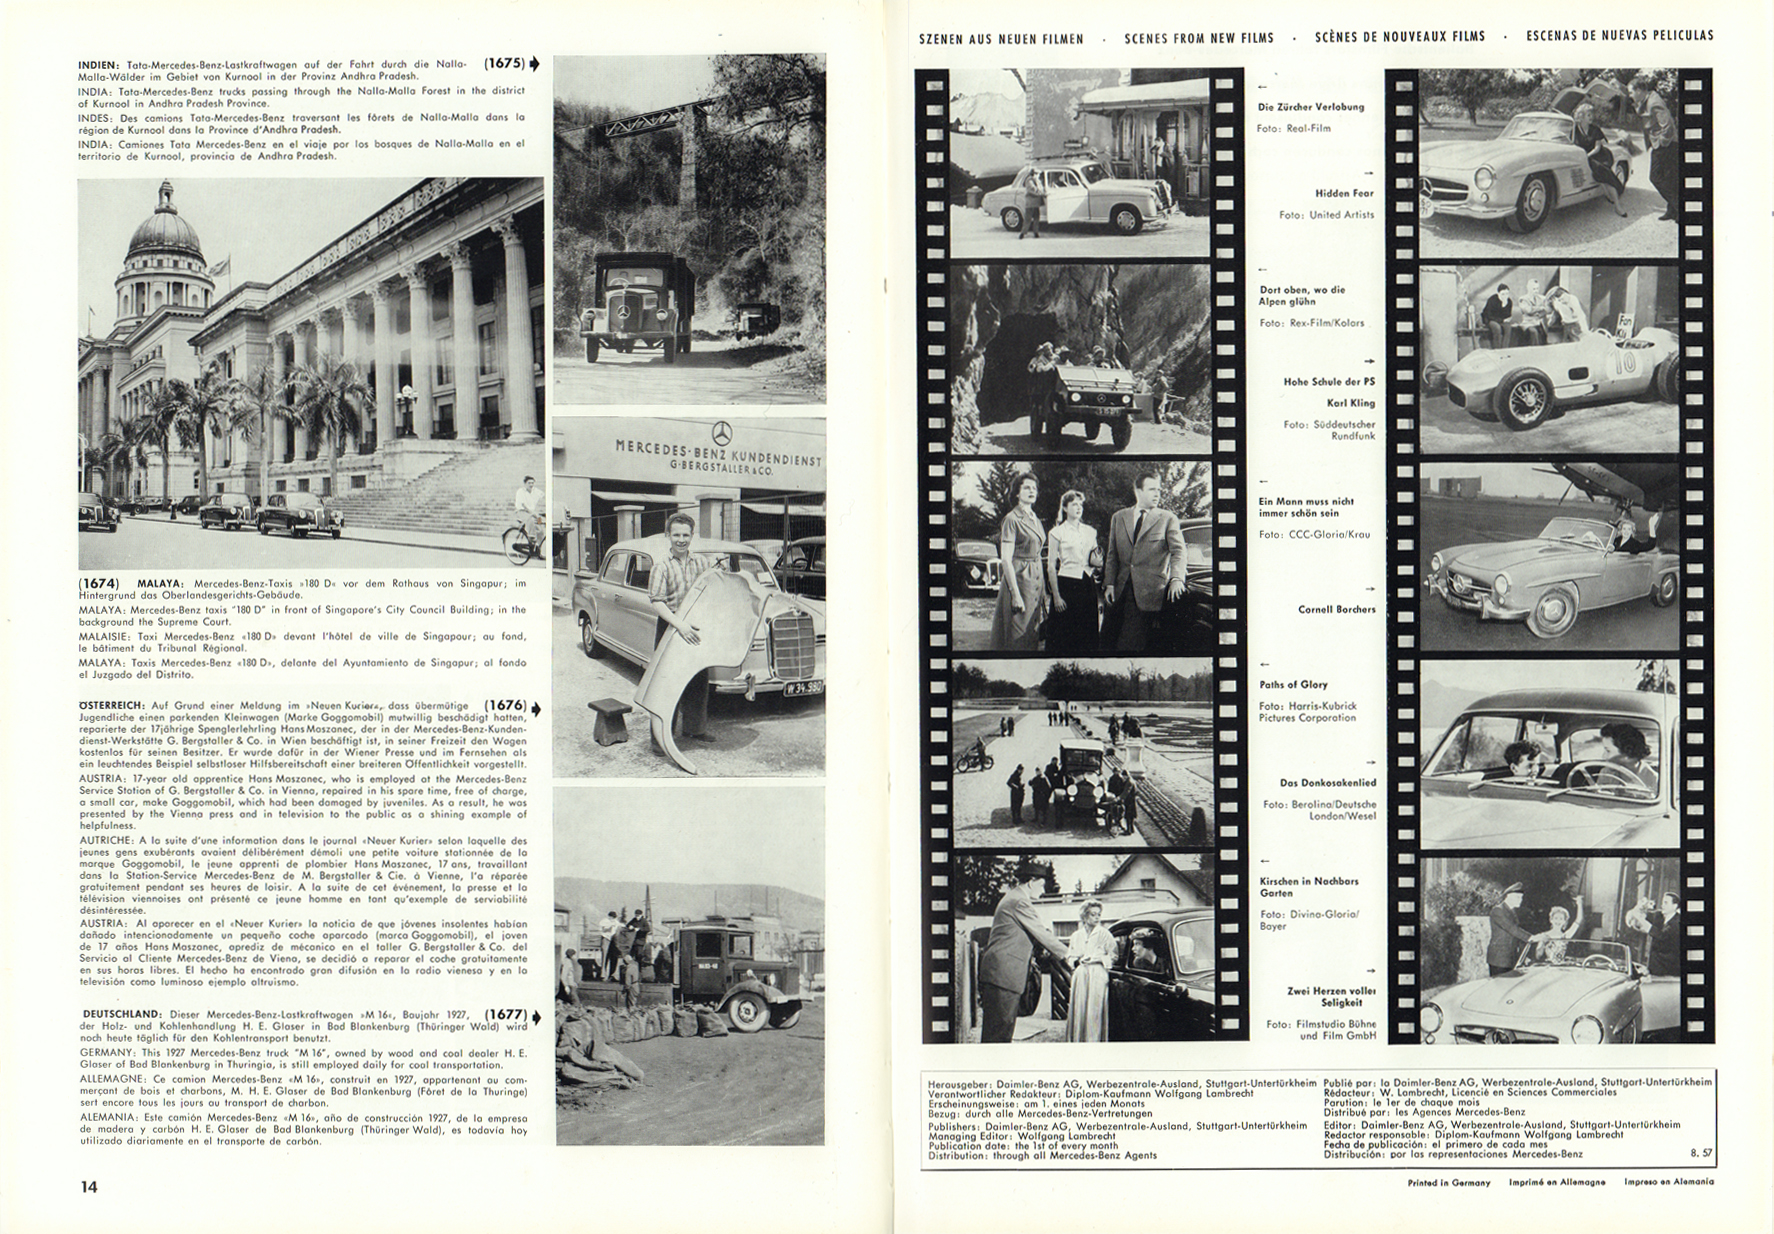 (REVISTA): Periódico In aller welt n.º 12 - Mercedes-Benz no mundo - 1957 - multilingue 008